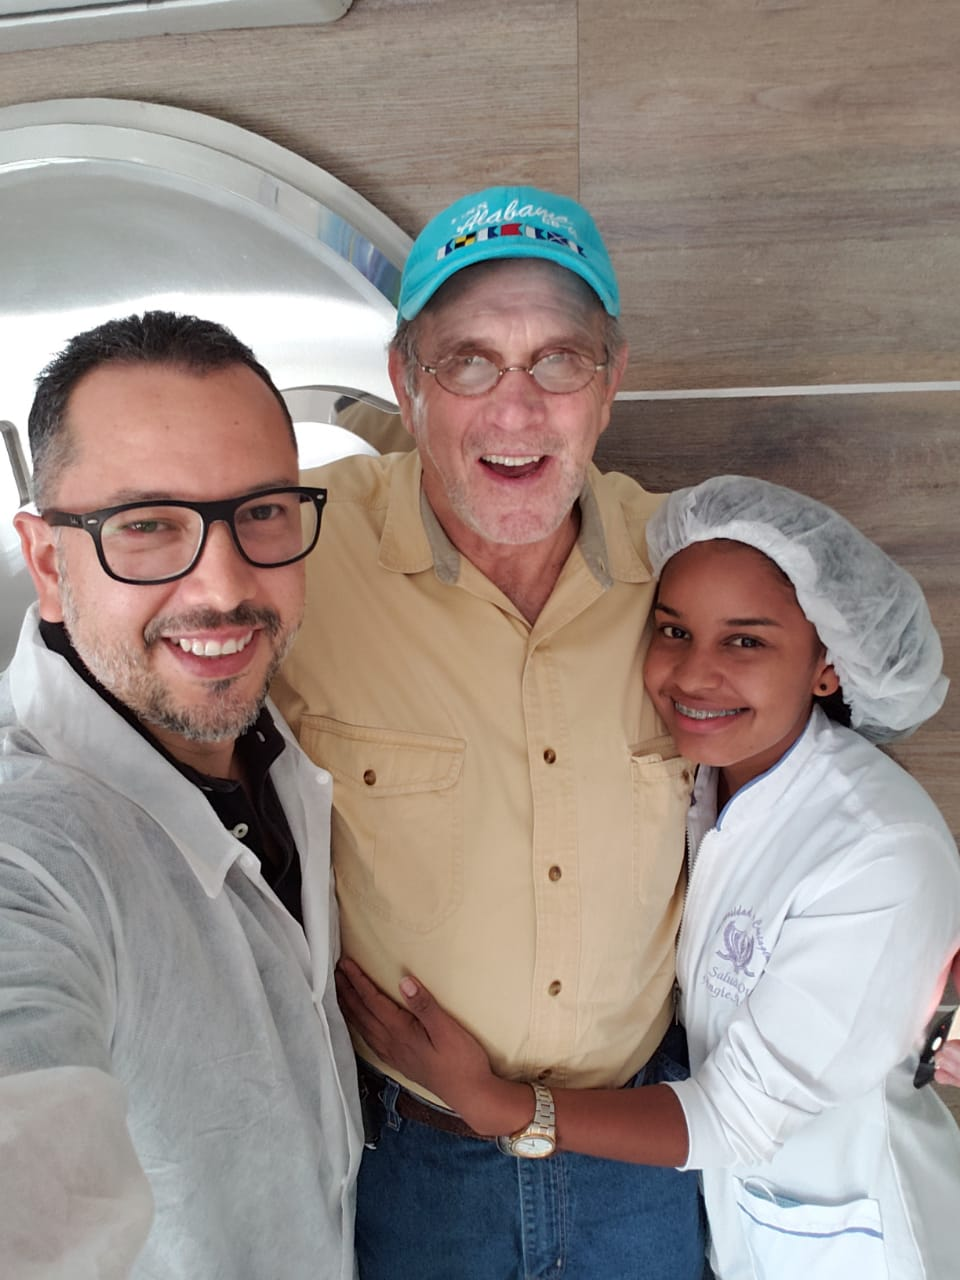 Joe - Breaking Down The Cost Of Dental Implants In Colombia, South America